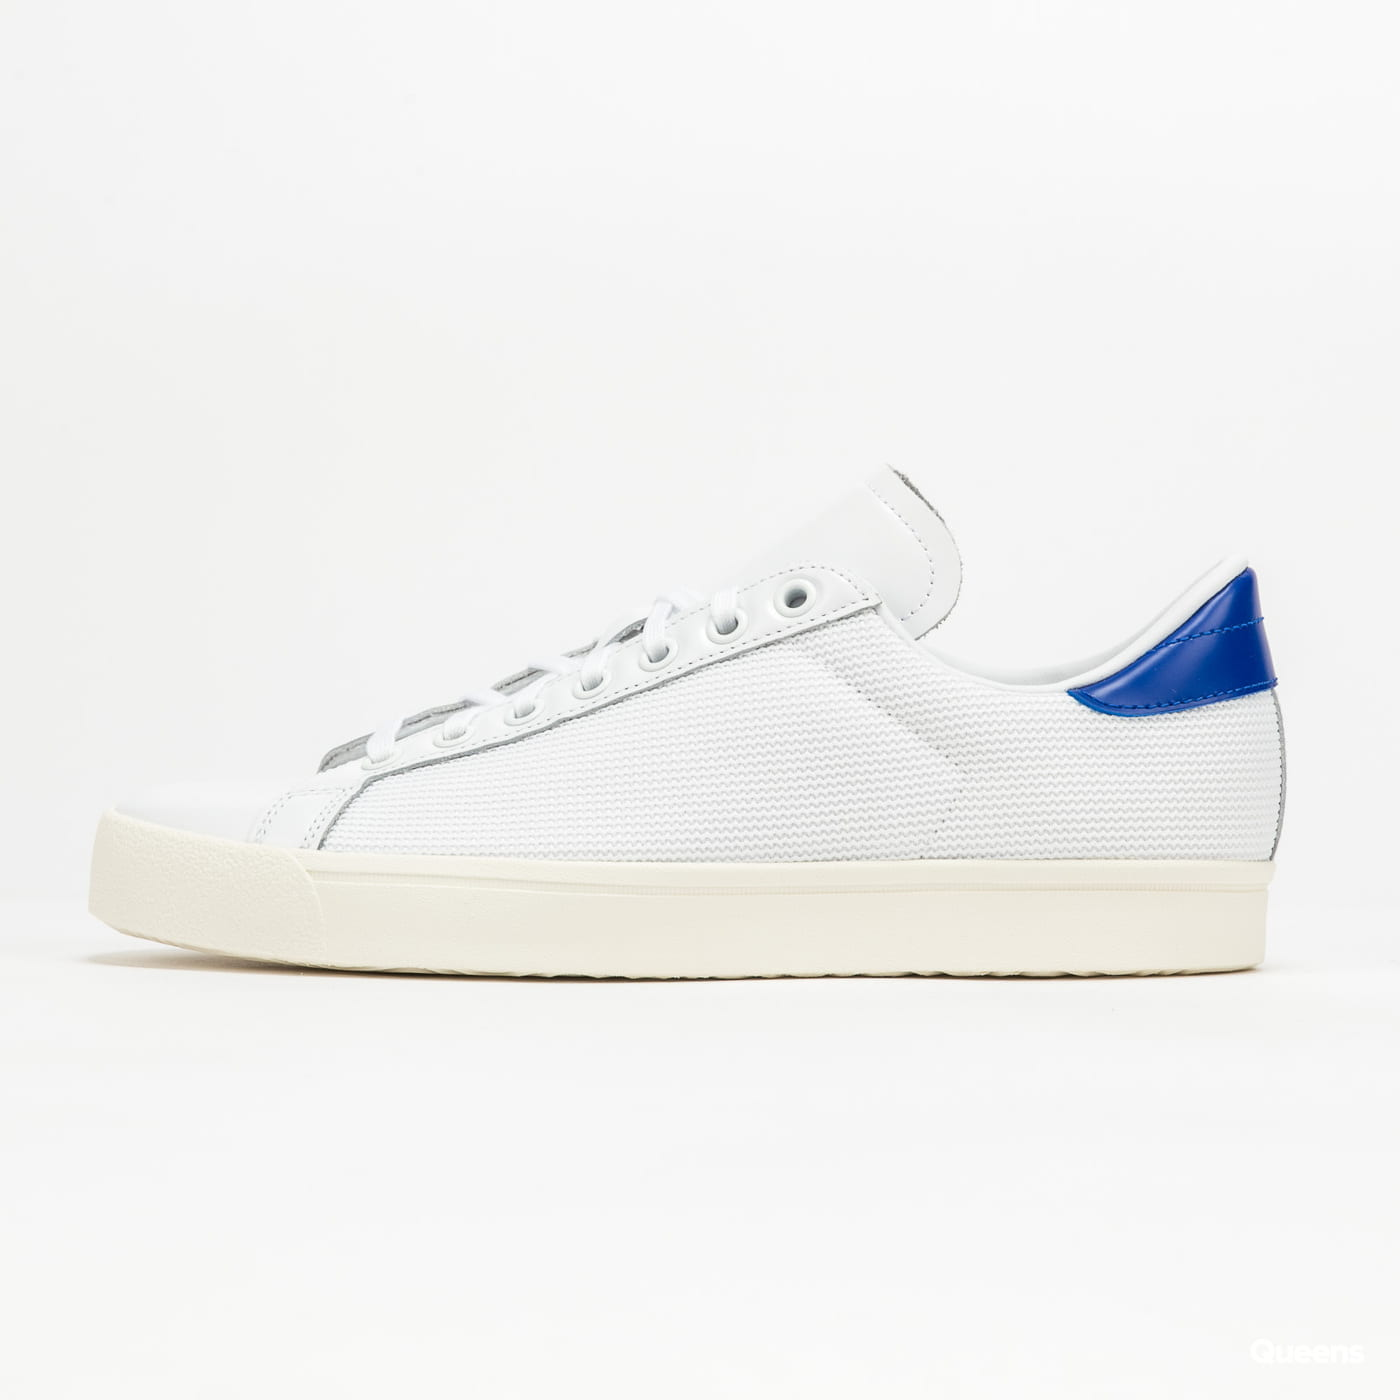 adidas Originals Rod Laver Vin ftwwht / ftwwht / poblue